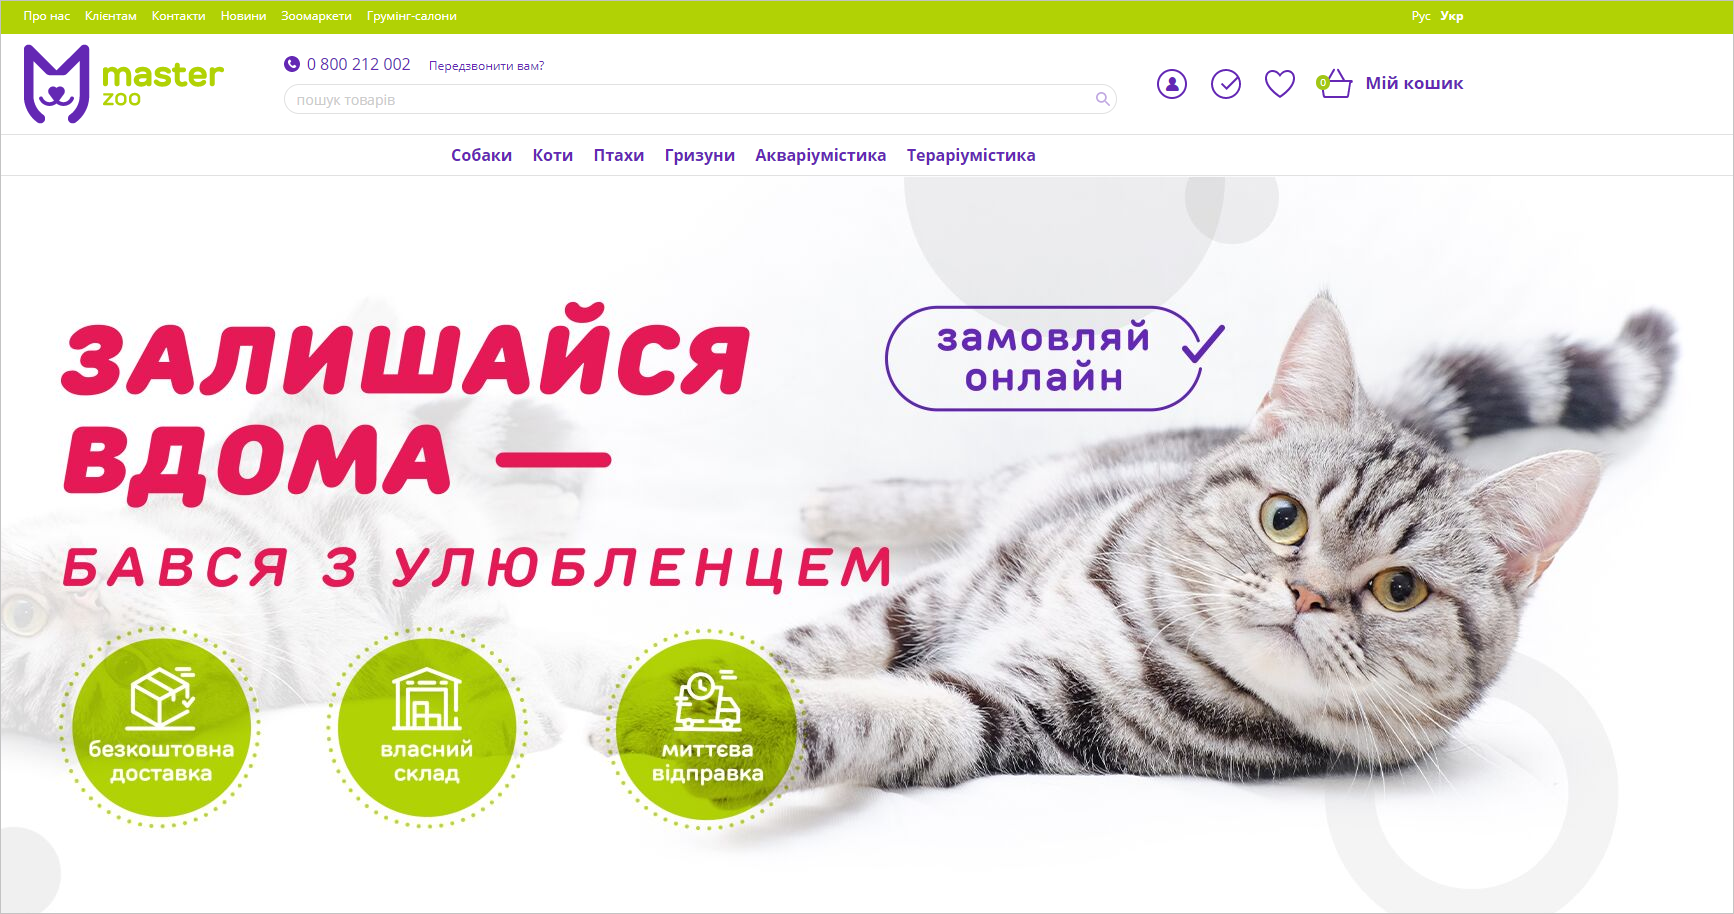 Сайт интернет-магазина MasterZoo